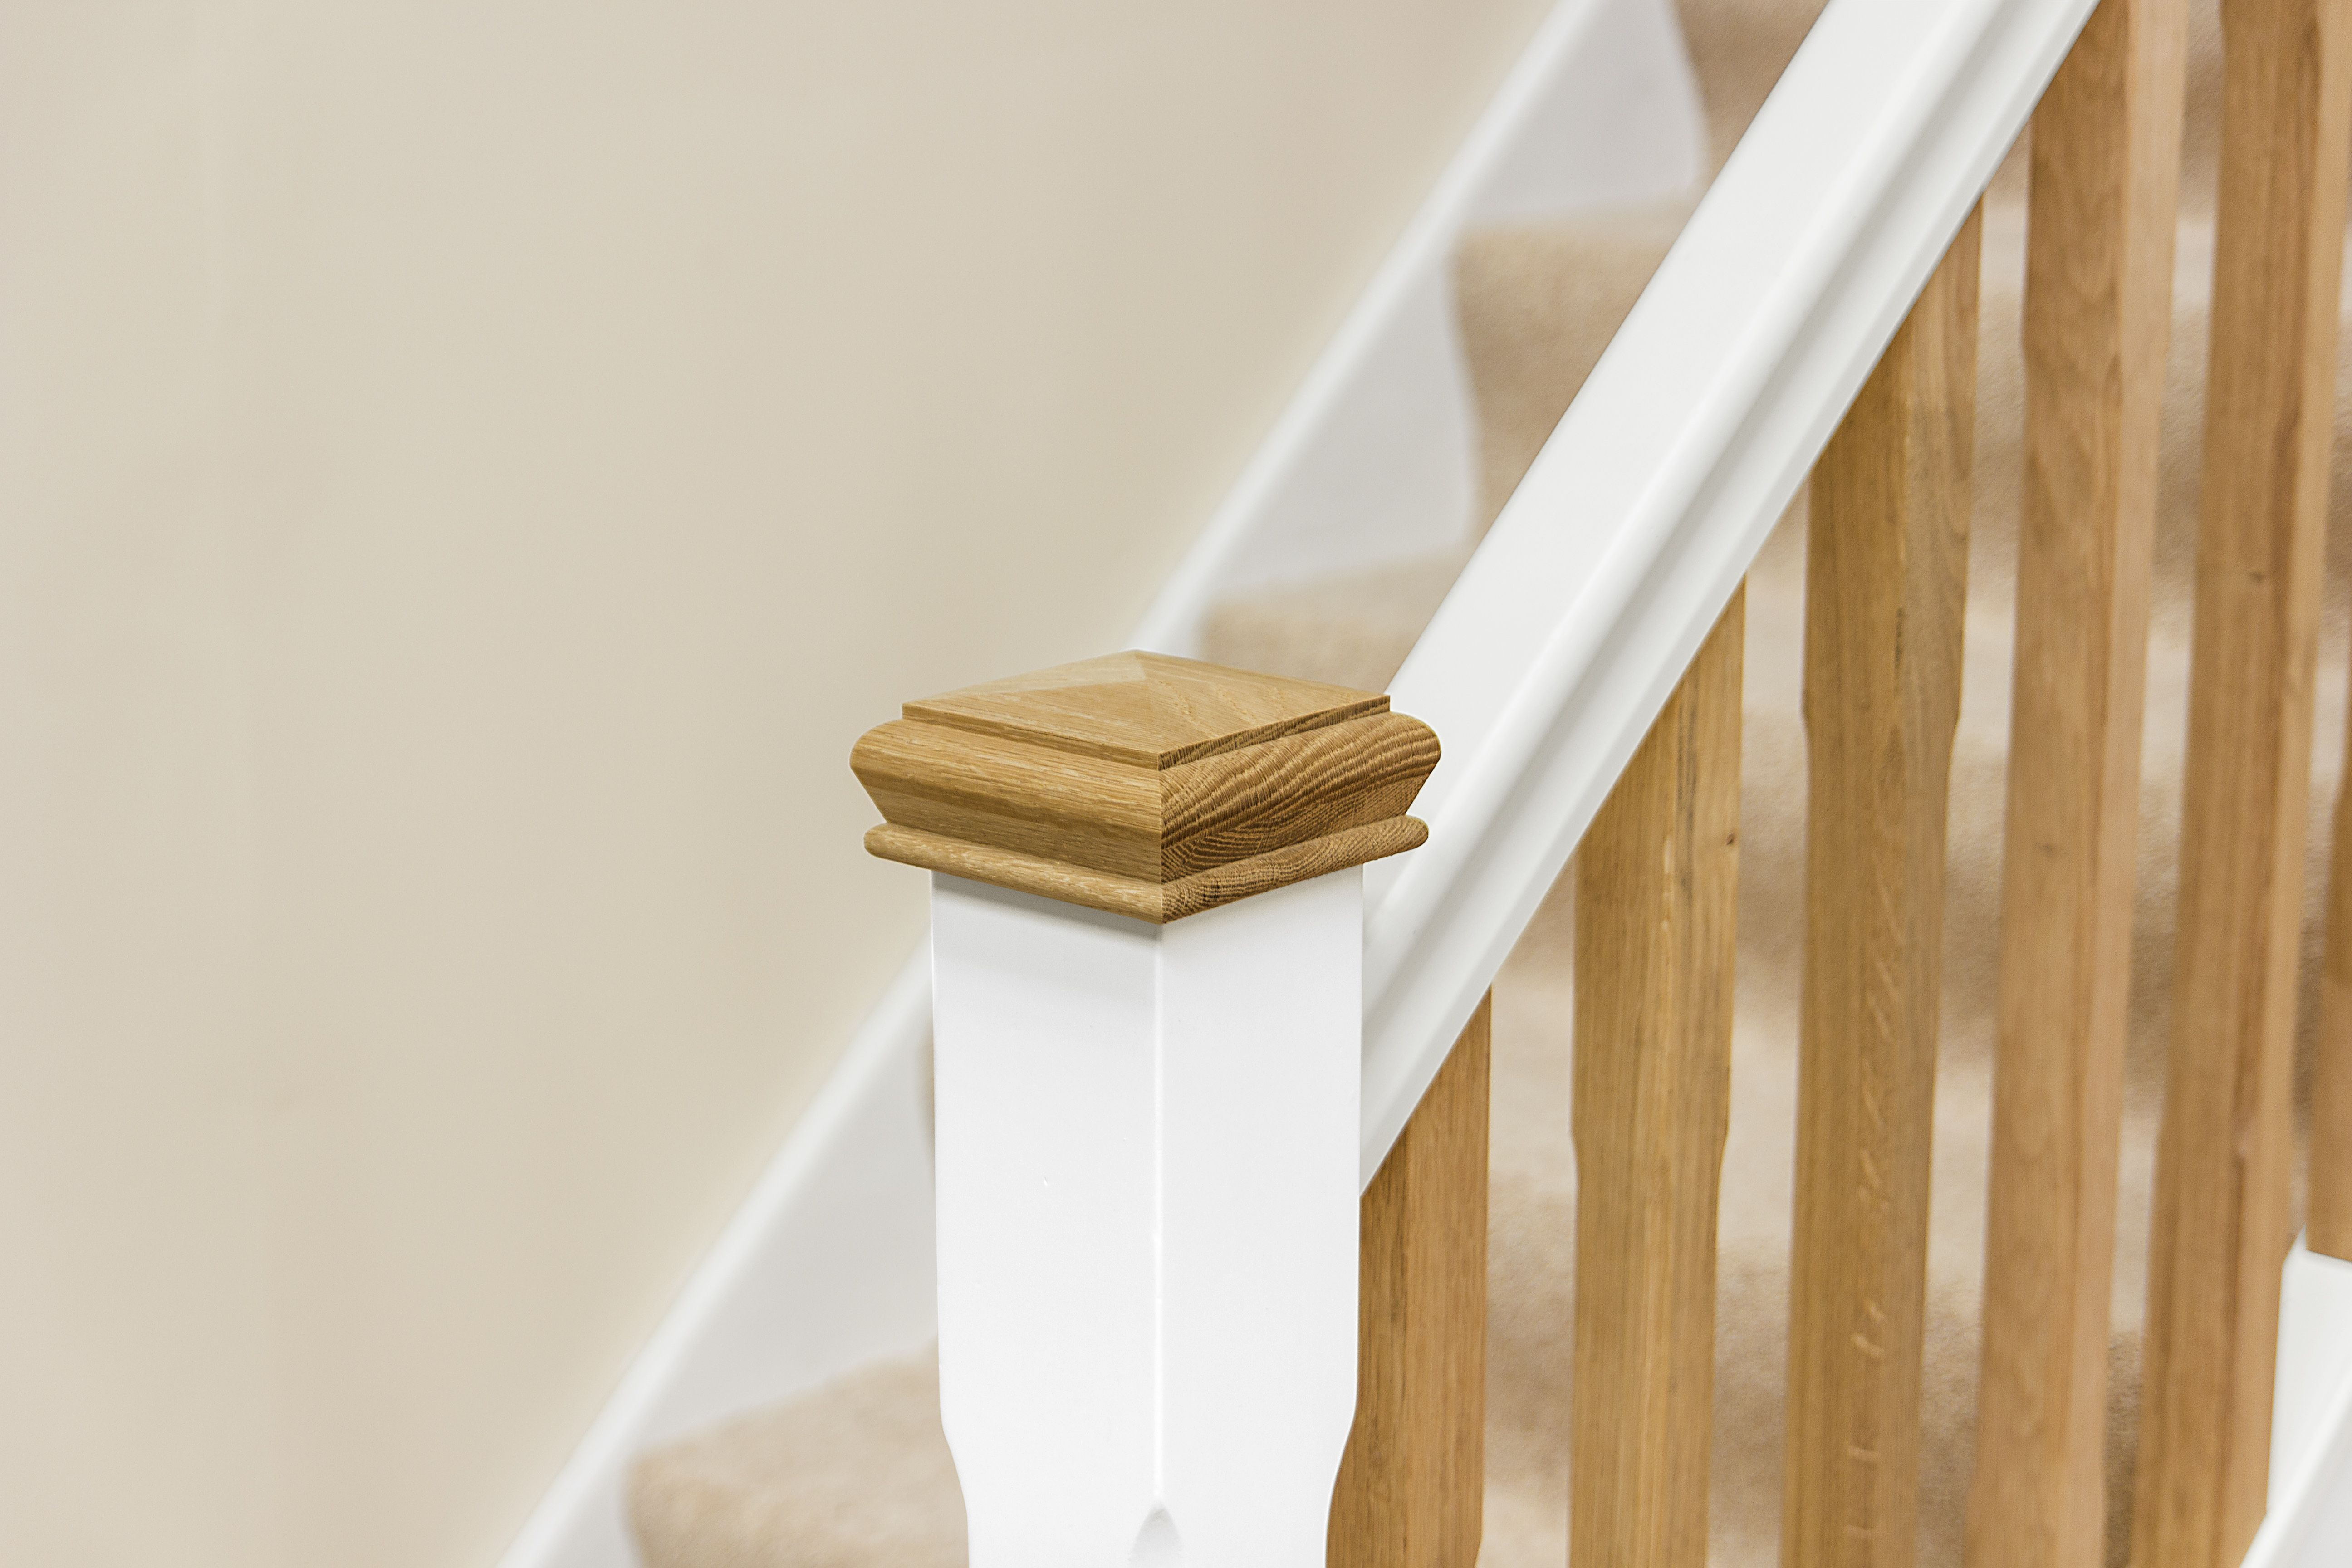 Best White Primed Handrail With Oak Spindles Handrail Design 400 x 300